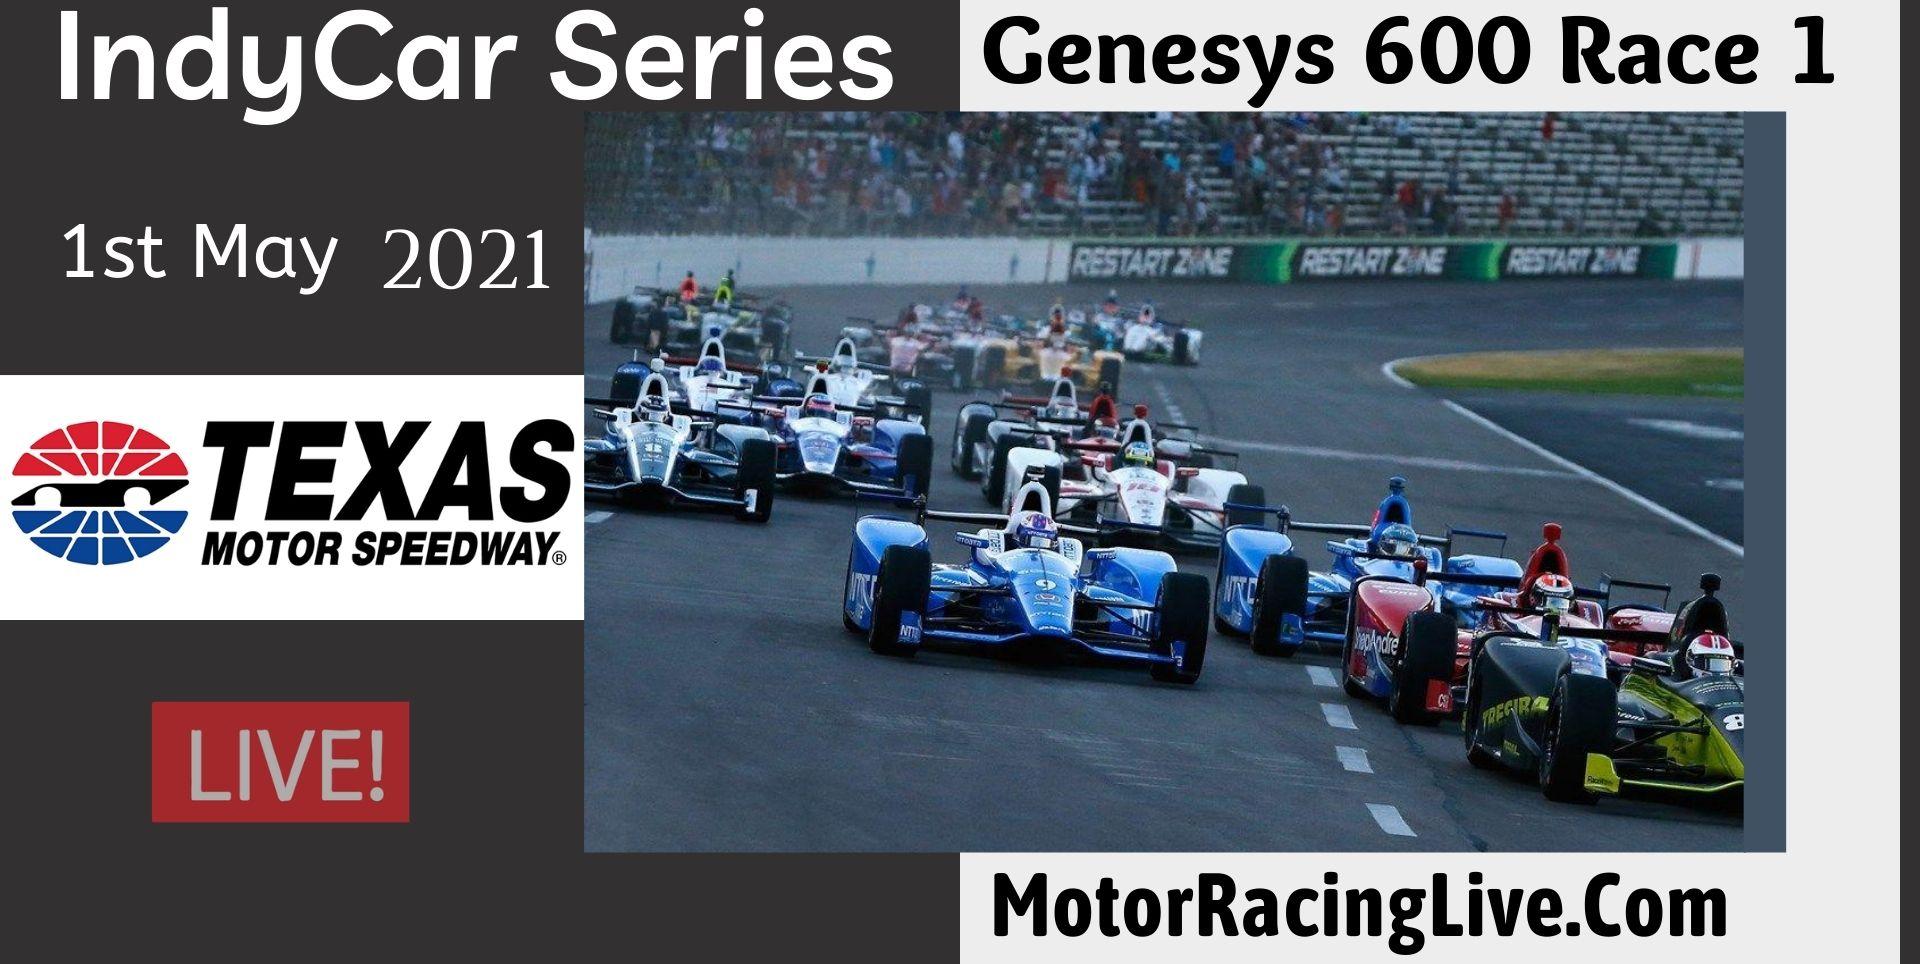 Genesys 600 Race 1 Live Stream 2021 | Indycar